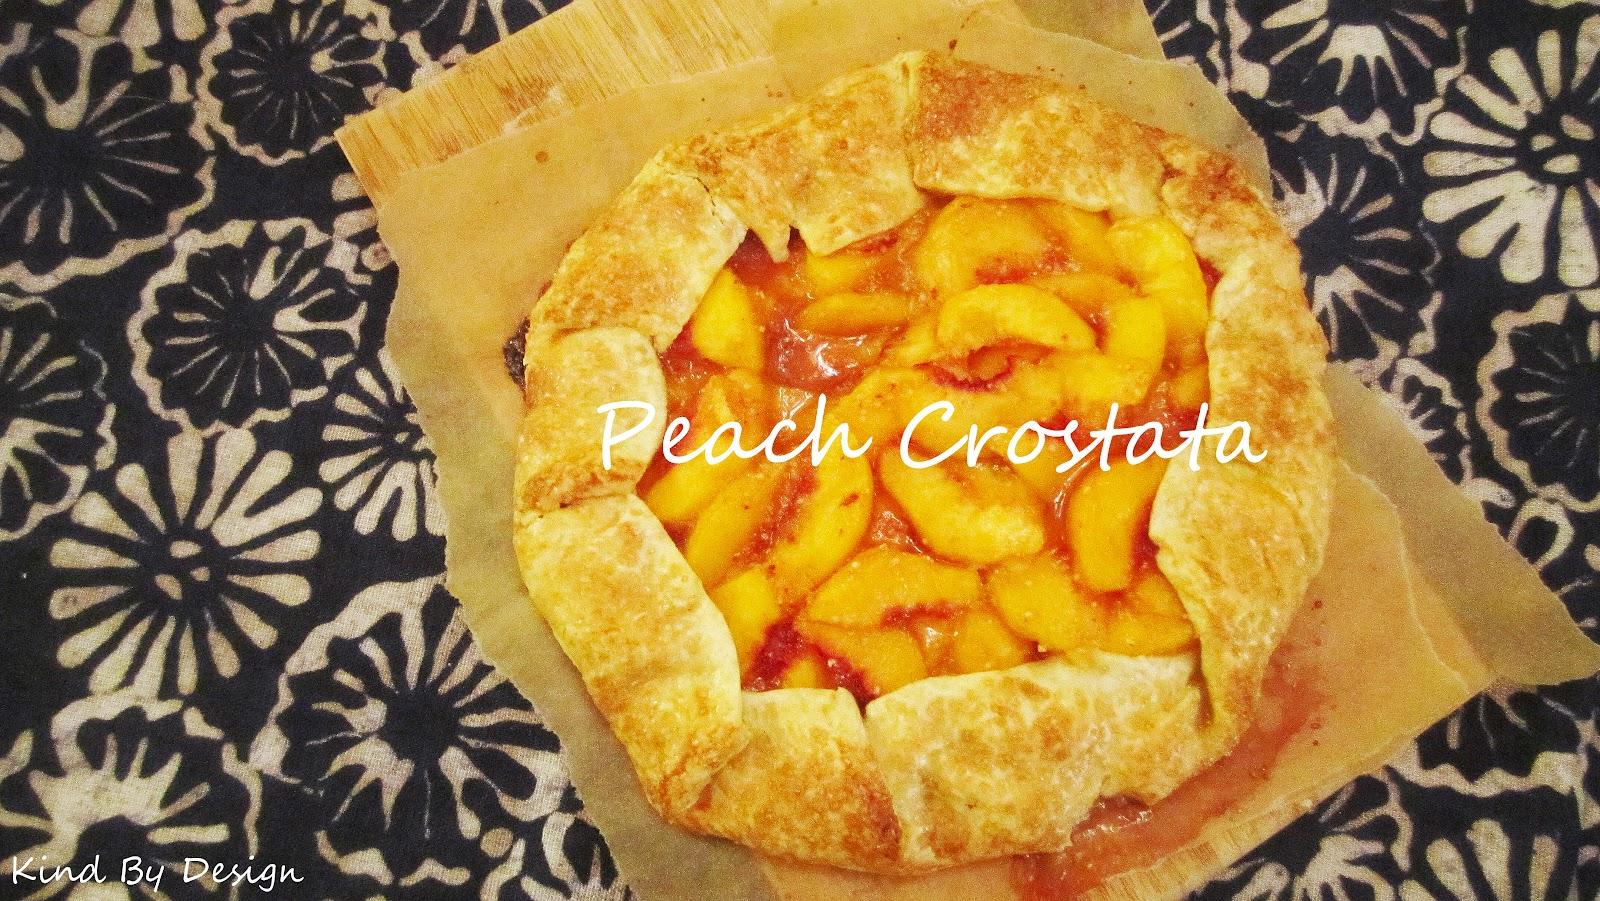 Peach Crostata.